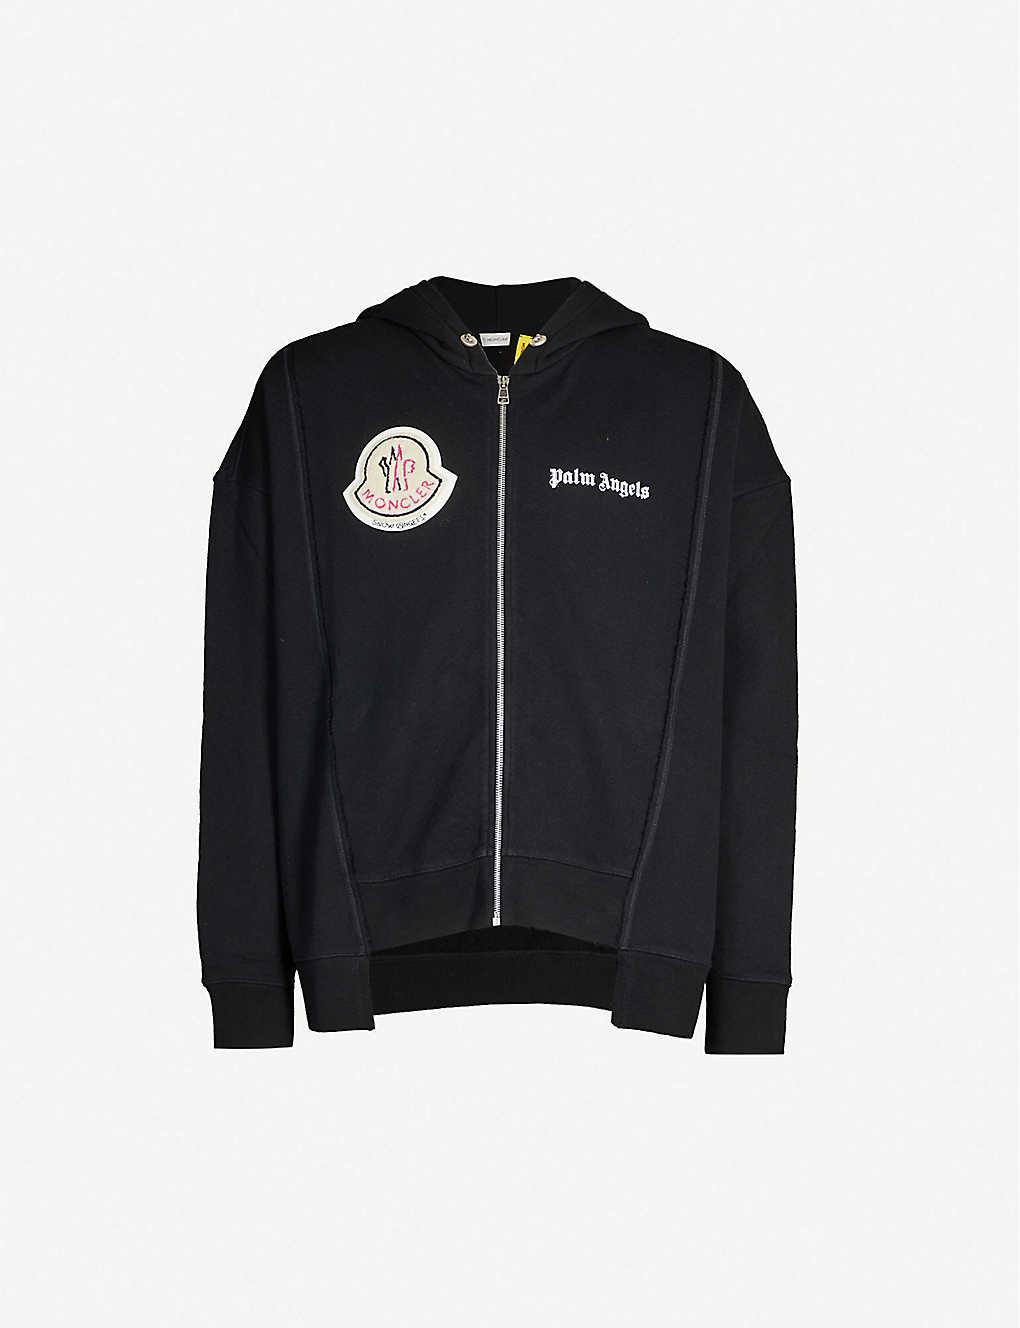 6ebab3b0f Moncler 8 Palm Angels cotton-jersey hoody